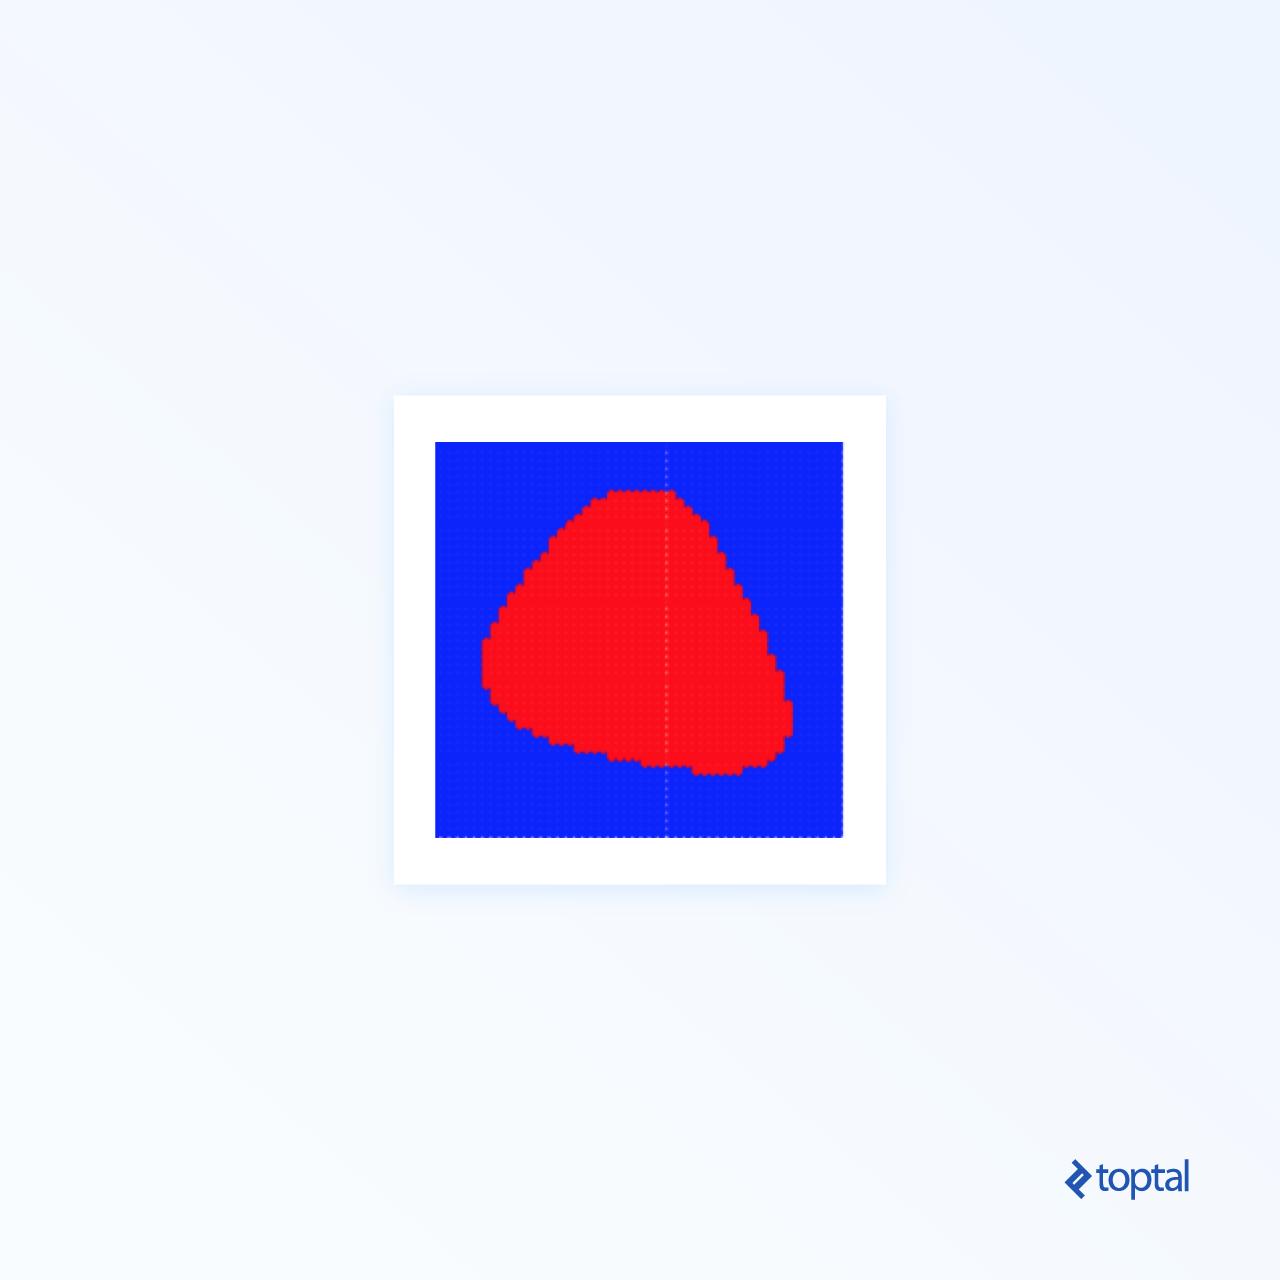 Almost triangle